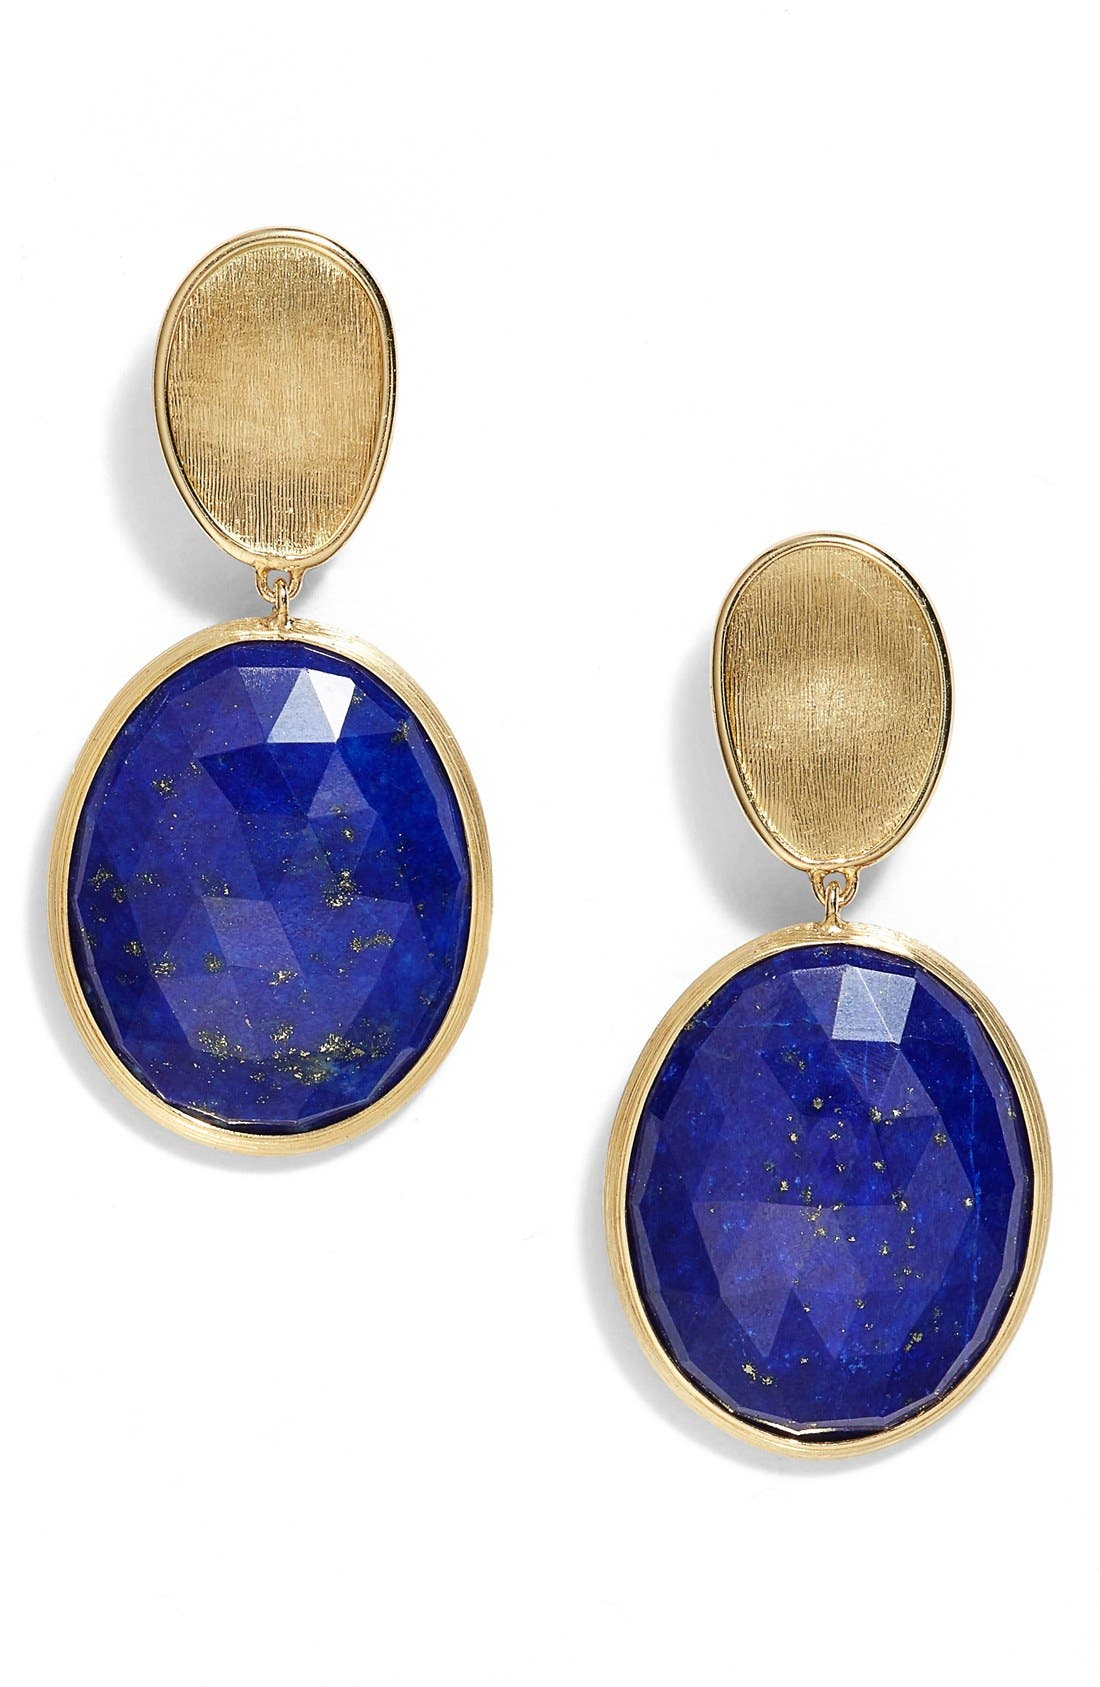 Marco Bicego Lunaria Semiprecious Stone Drop Earrings